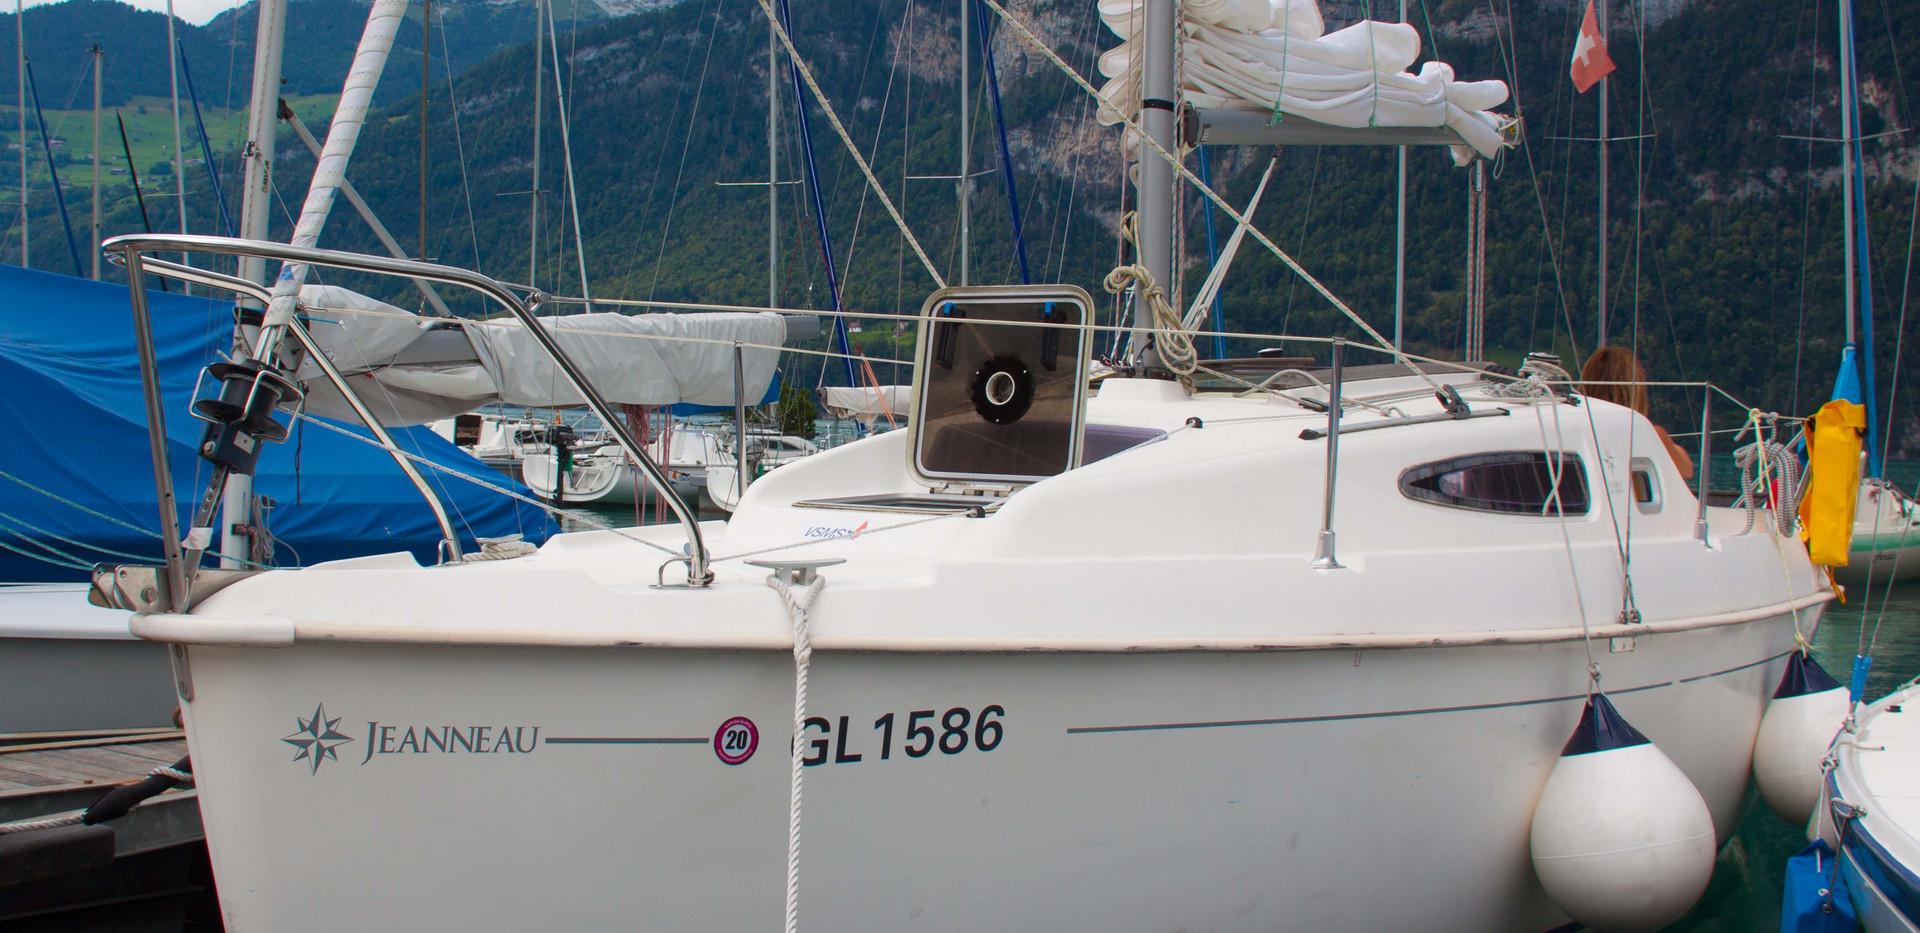 Segelyacht mieten am Walensee